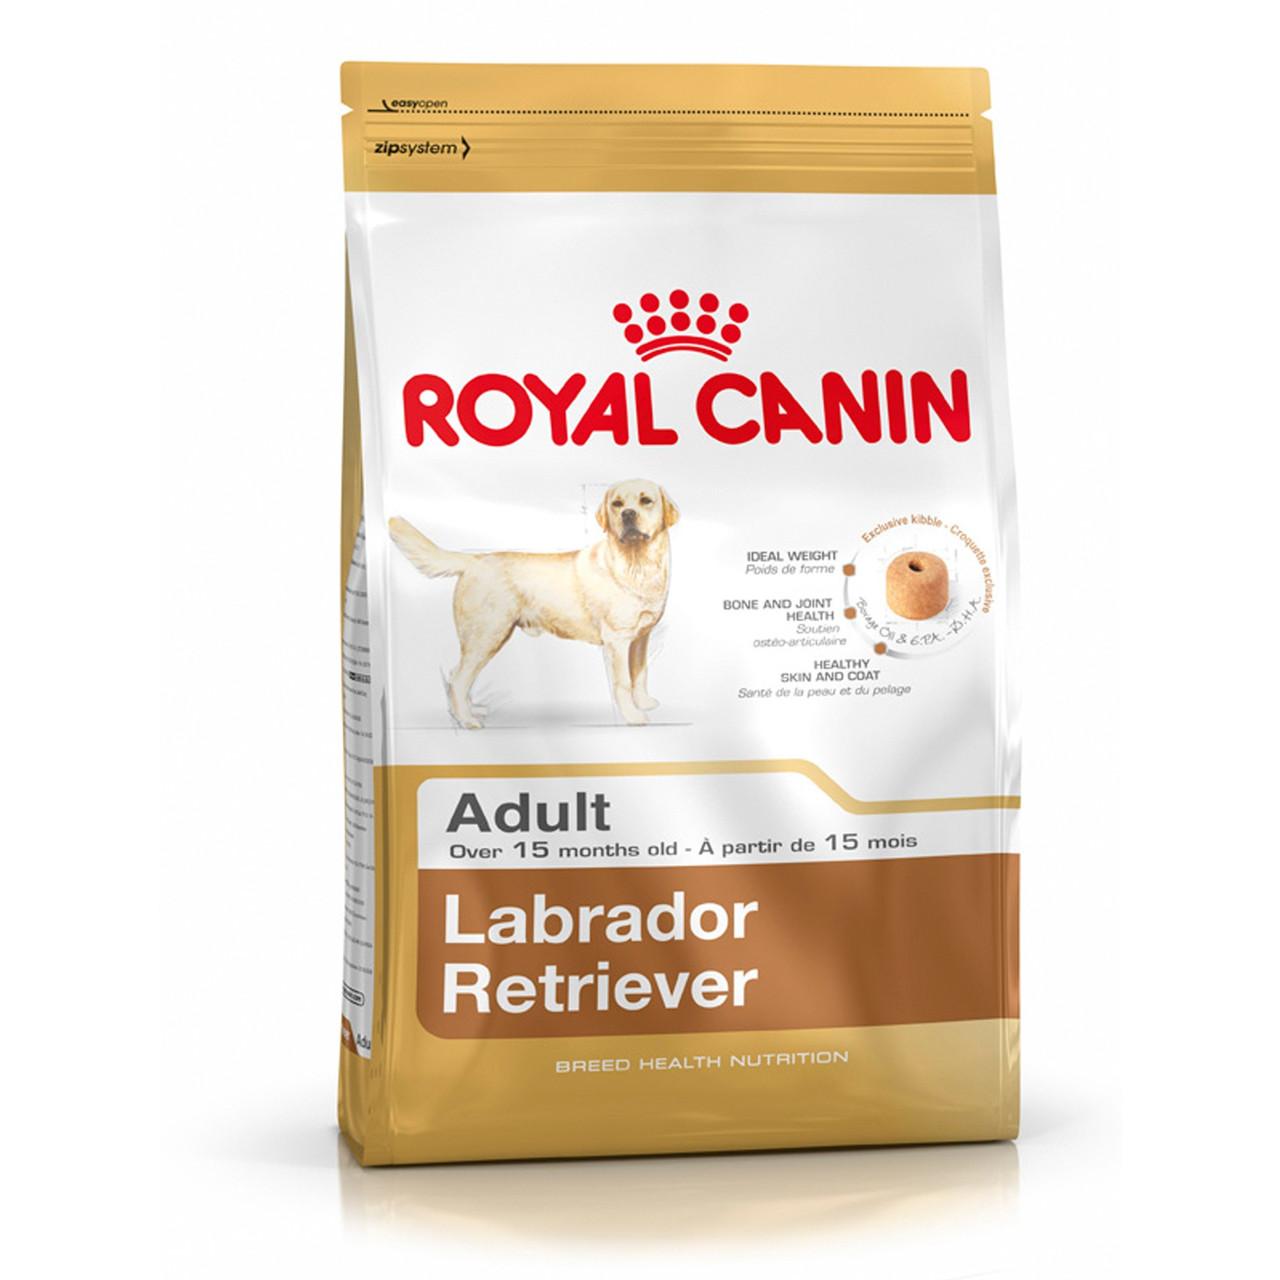 Сухой корм для собак Royal Canin (РОЯЛ КАНИН) LABRADOR RETRIEVER ADULT Лабрадор старше 15 месяцев, 12 кг